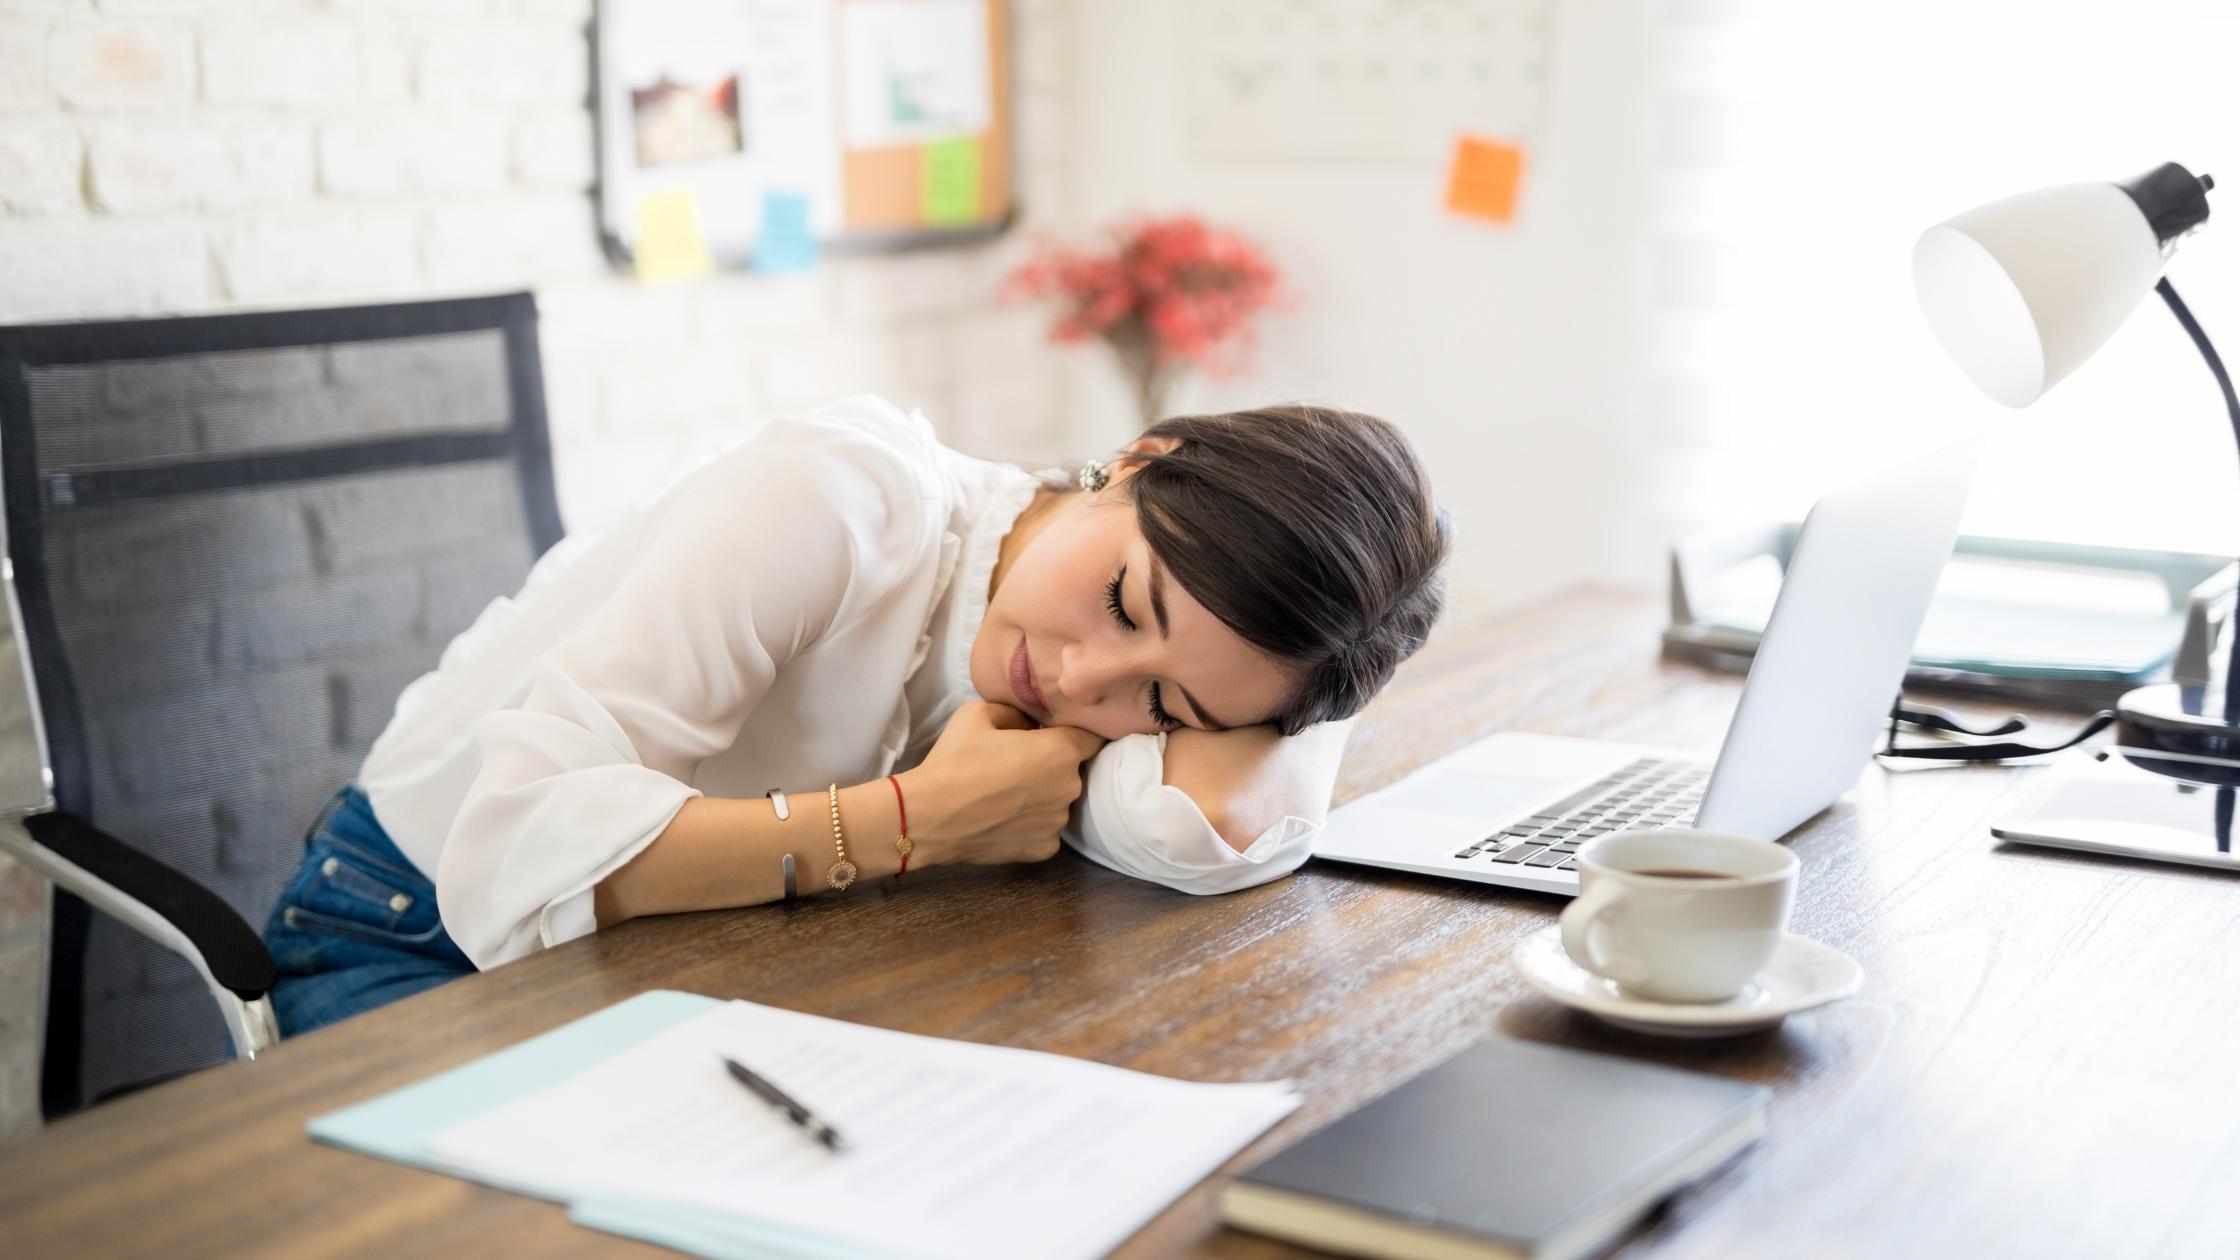 Australians face long working hours